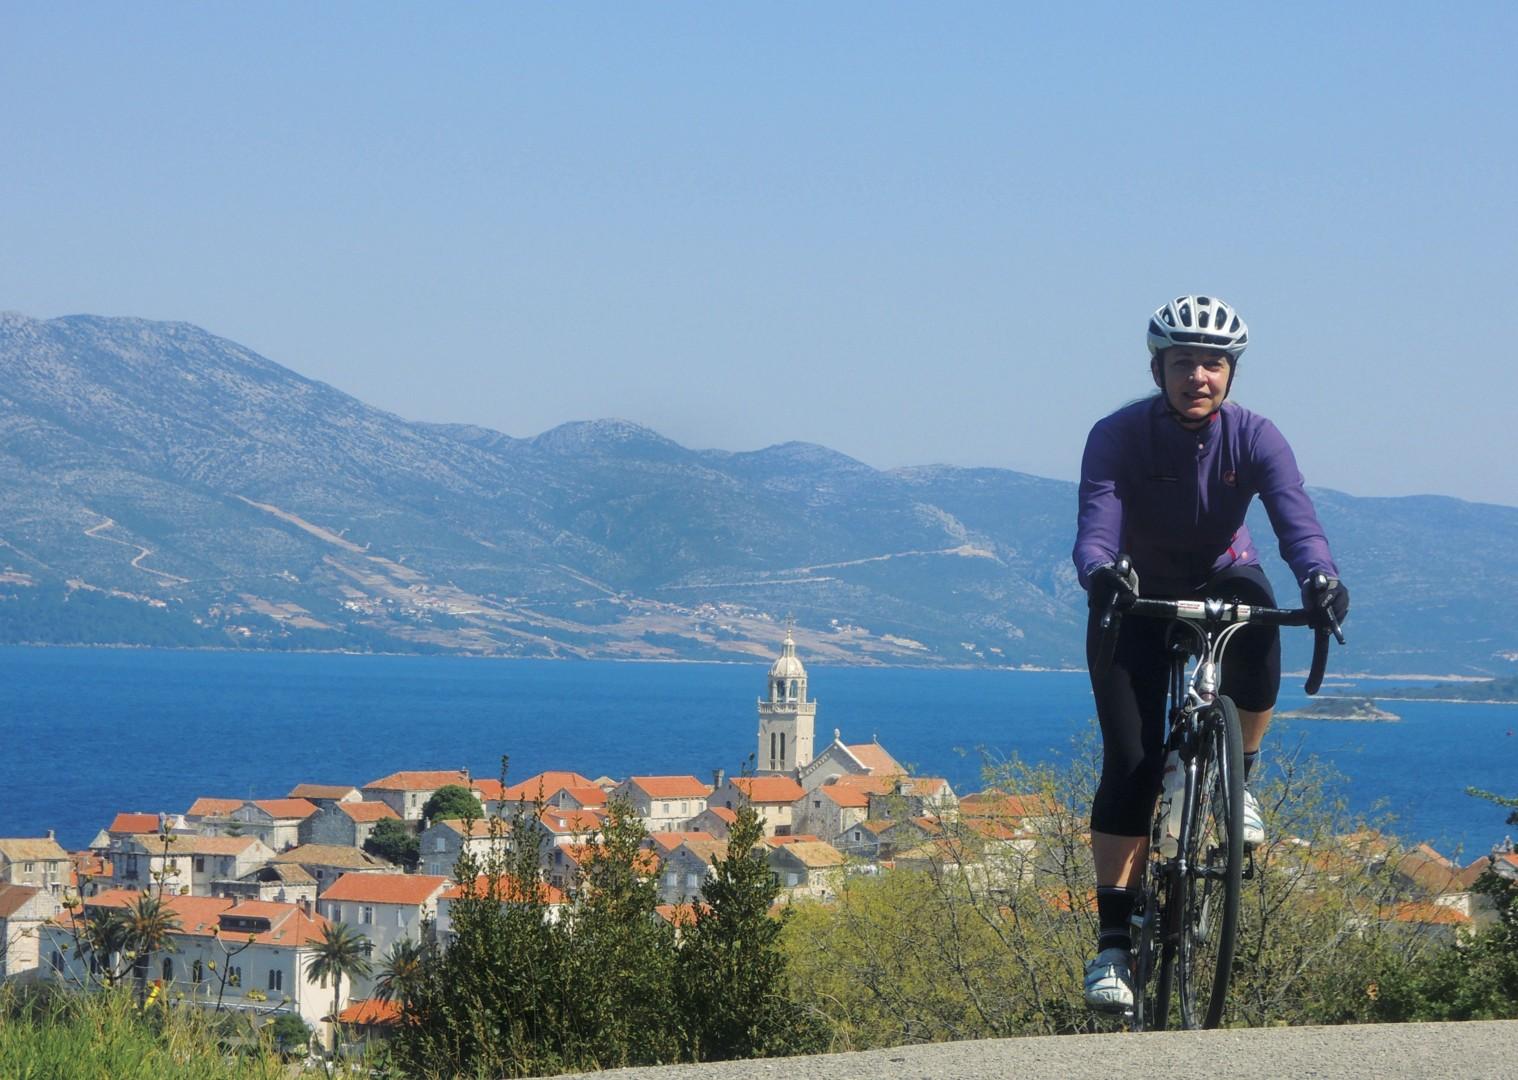 croatiaroad9.jpg - Slovenia and Croatia - Slovenian Alps to Dalmatian Coast - Guided Road Cycling Holiday - Road Cycling